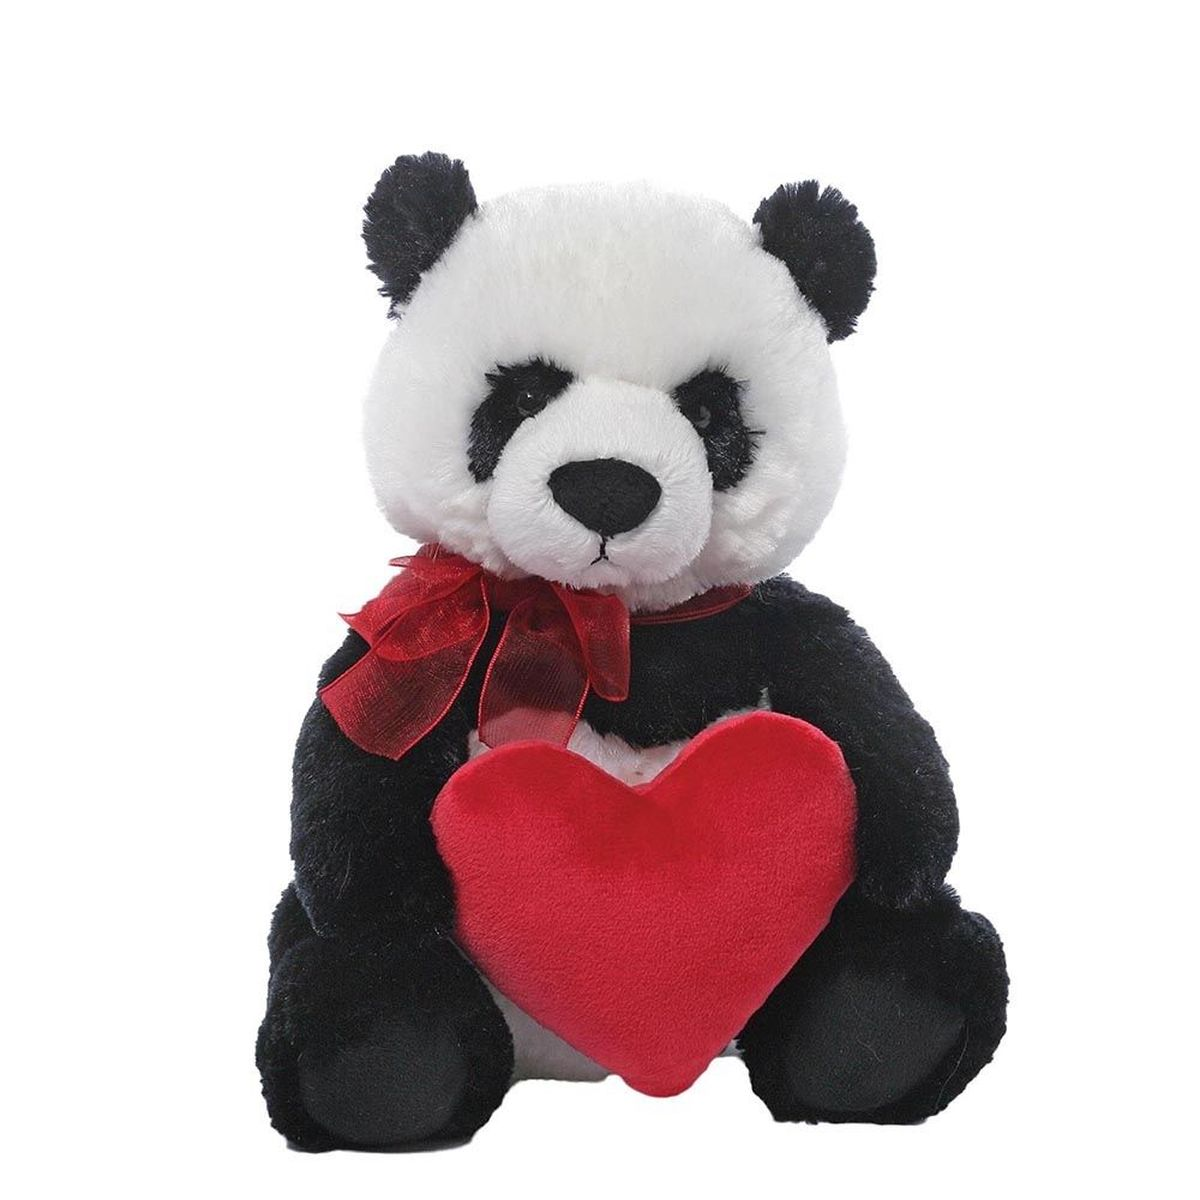 Gund Мягкая игрушка Pandalove 21,5 см малышарики мягкая игрушка собака бассет хаунд 23 см